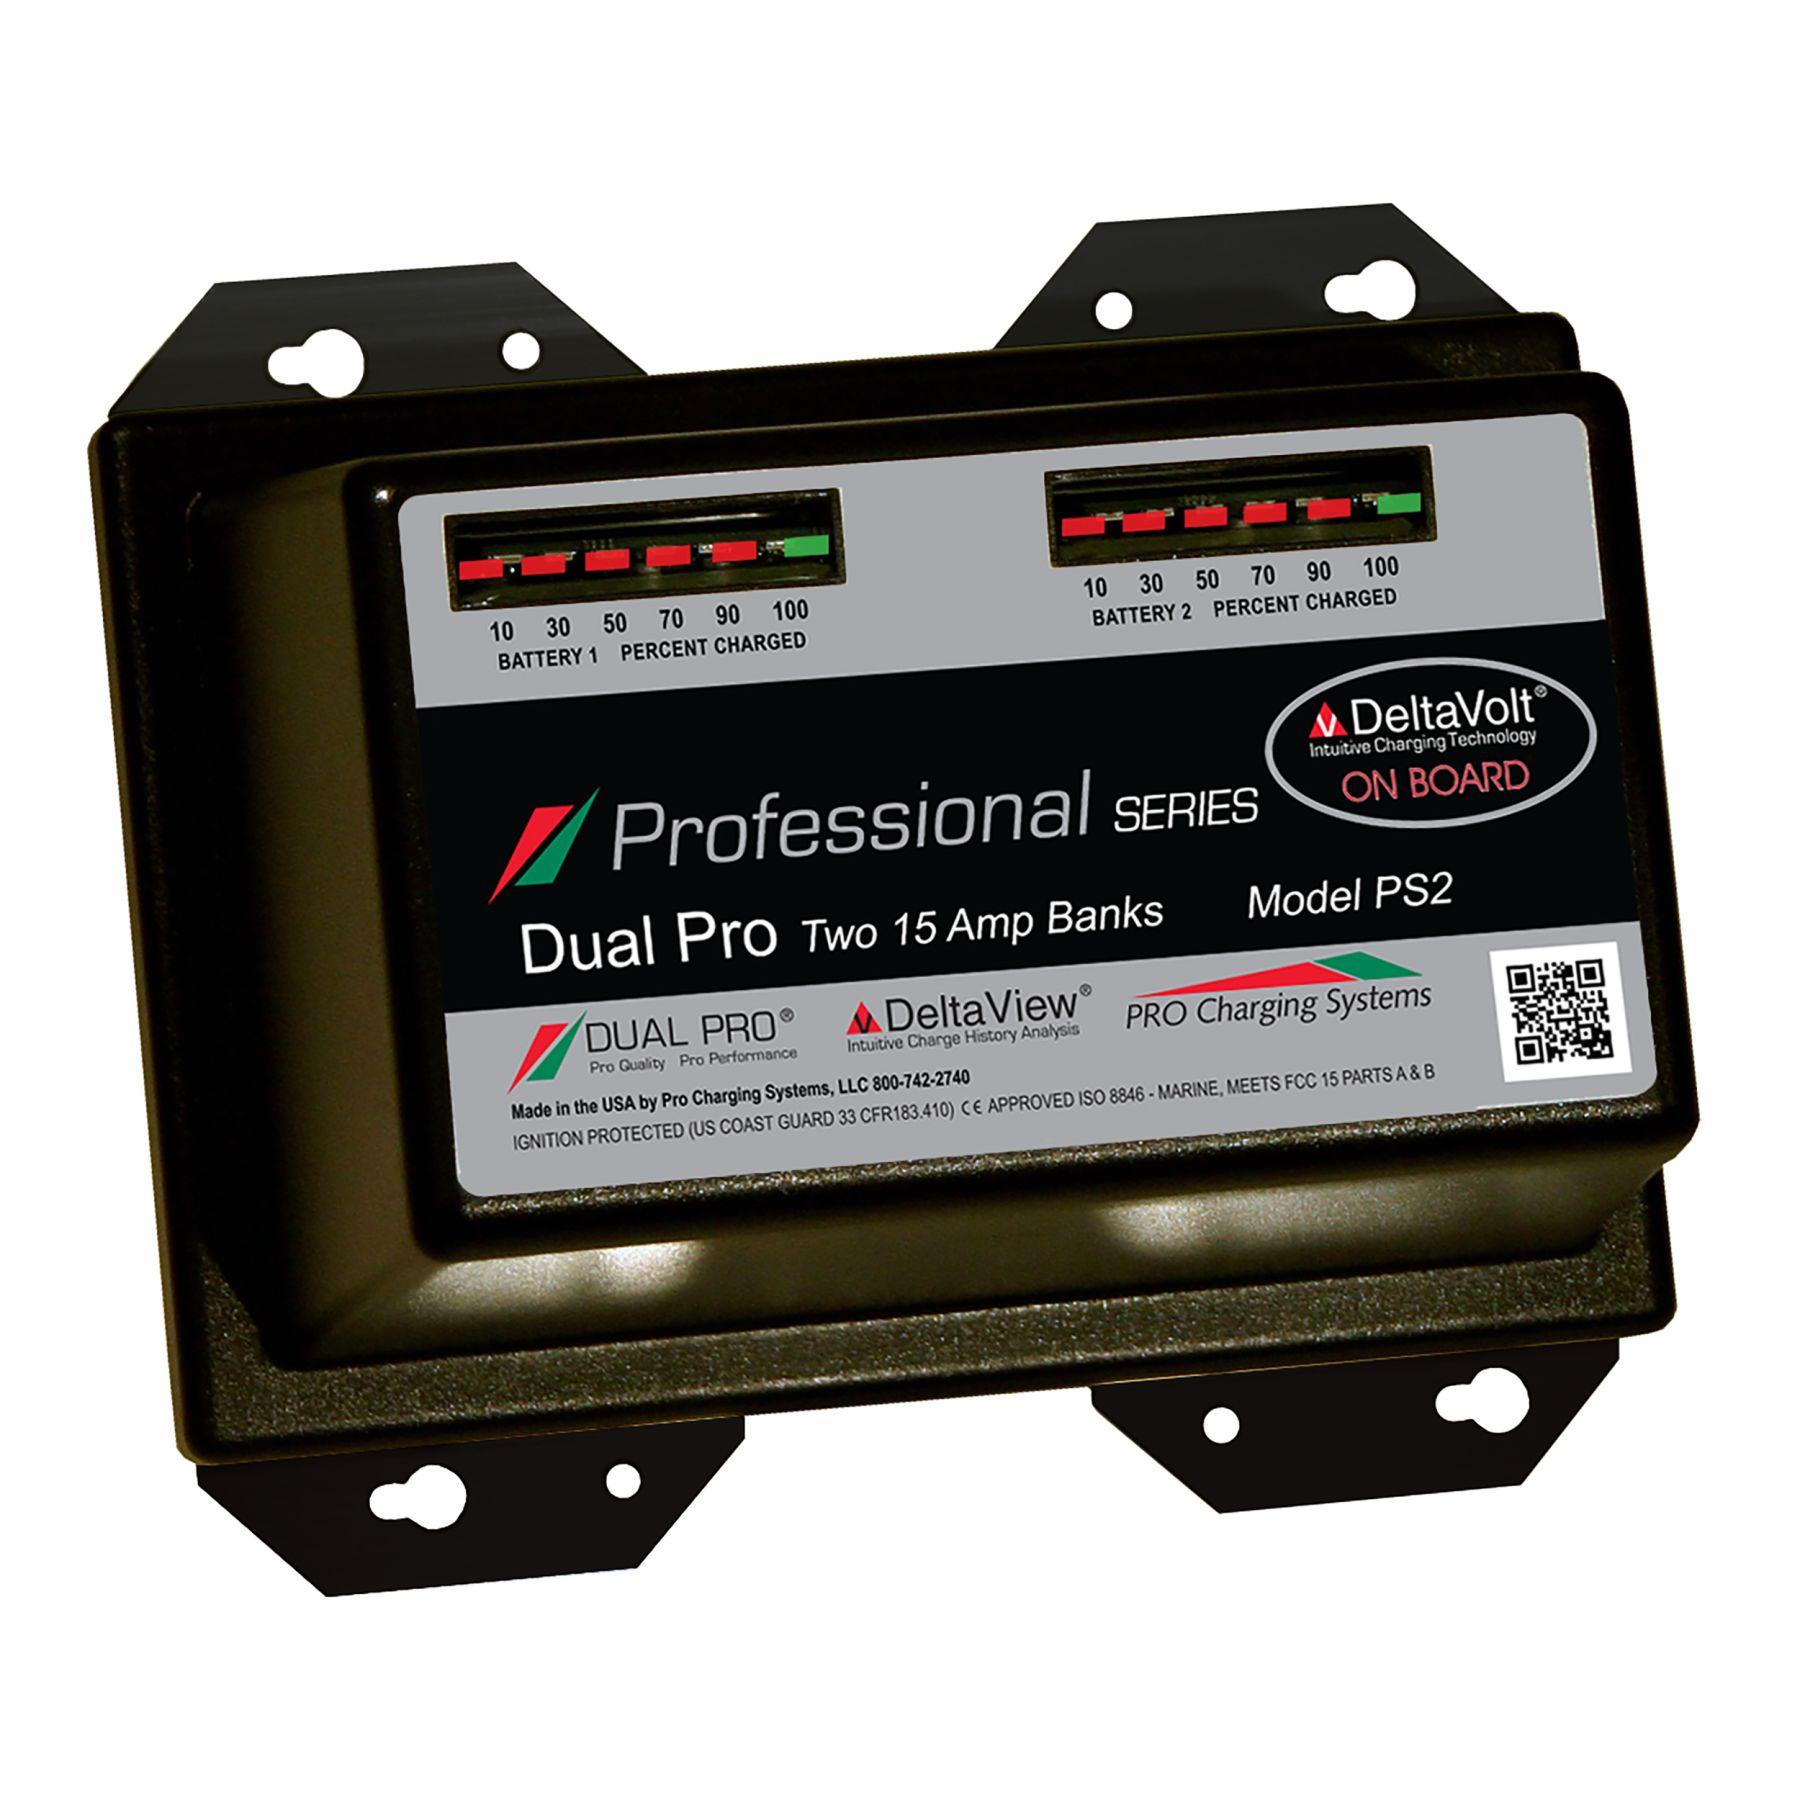 Ps2 Dual Pro 12v 24v 30 Amp 2 Bank Professional Series